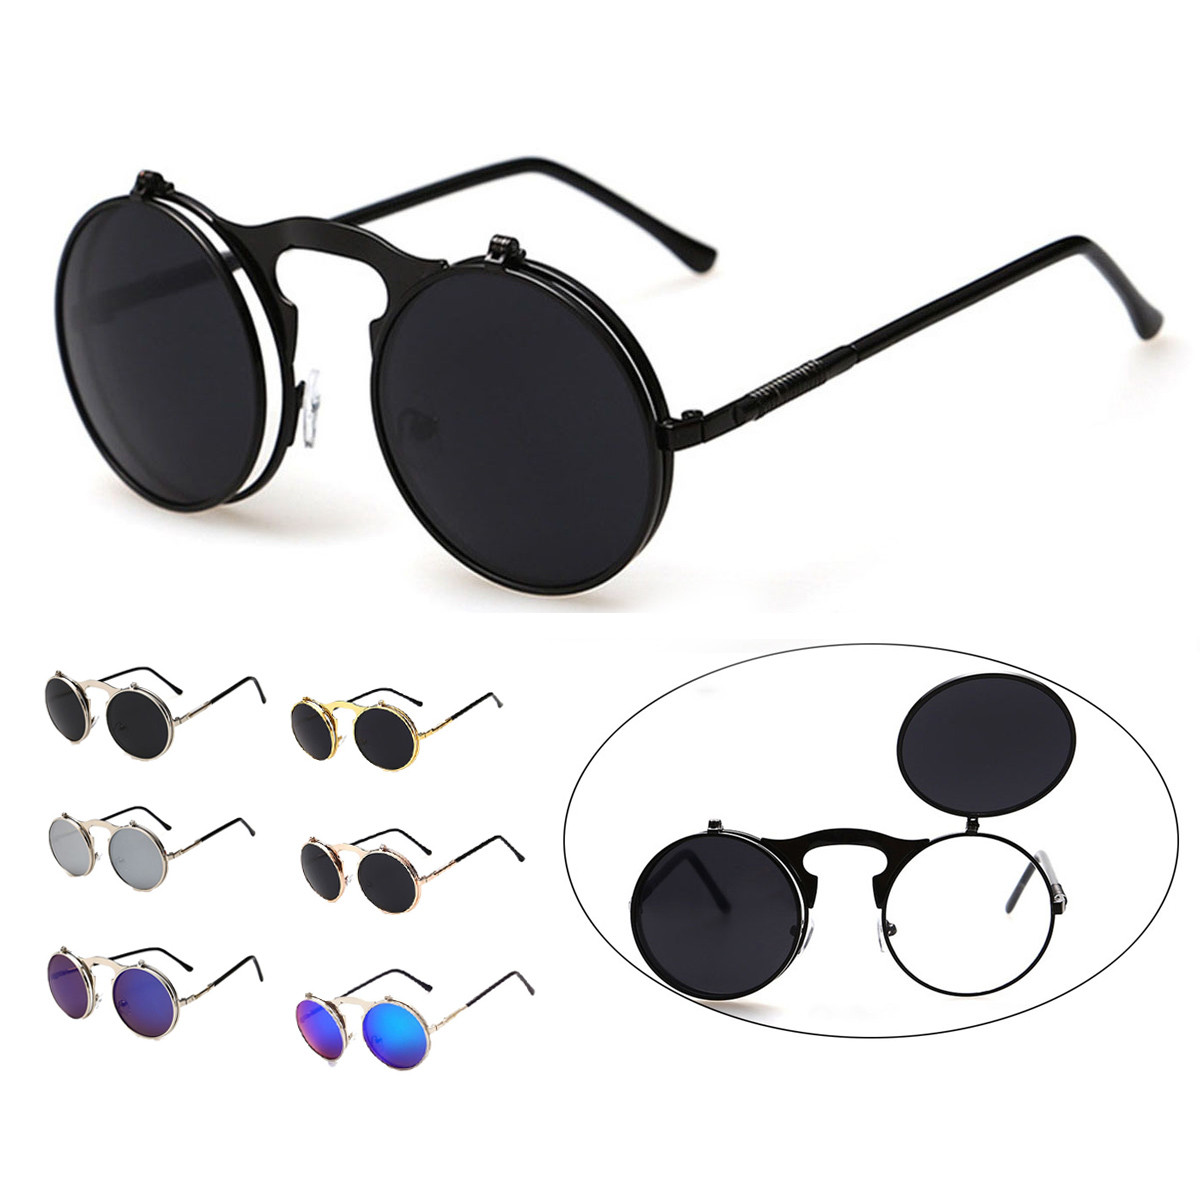 104f1ae51ed Women Vintage Steampunk Goggles Men Round Metal Flip Up Lens Sunglasses  Eyewear. 8633cb4e-2079-443a-ac93-18186e5150a1.jpg ...